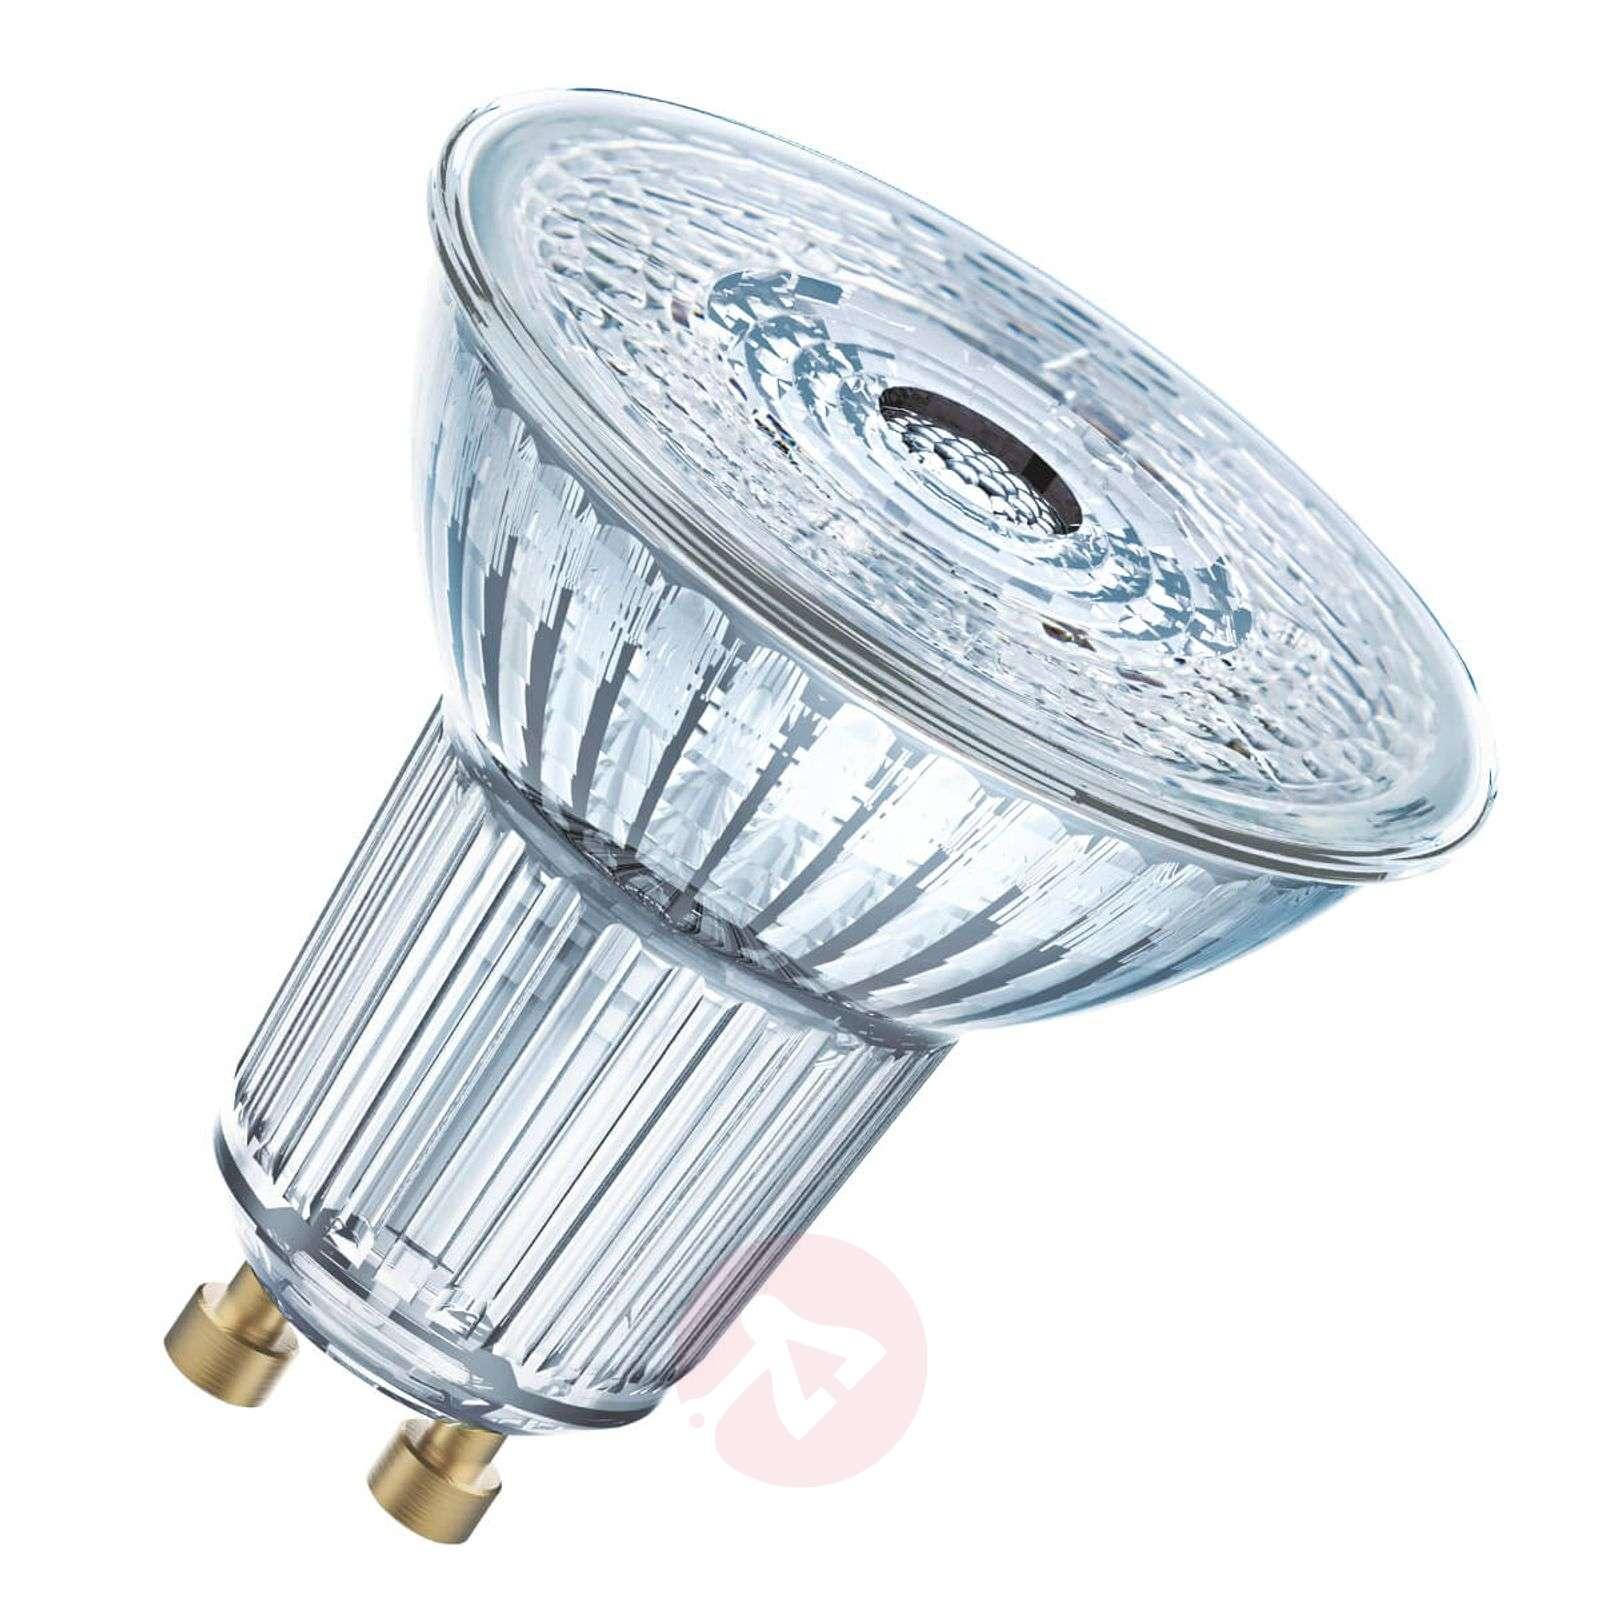 LED reflector bulb GU10 3,6 W, 350 lm, set of 3-7262108-02